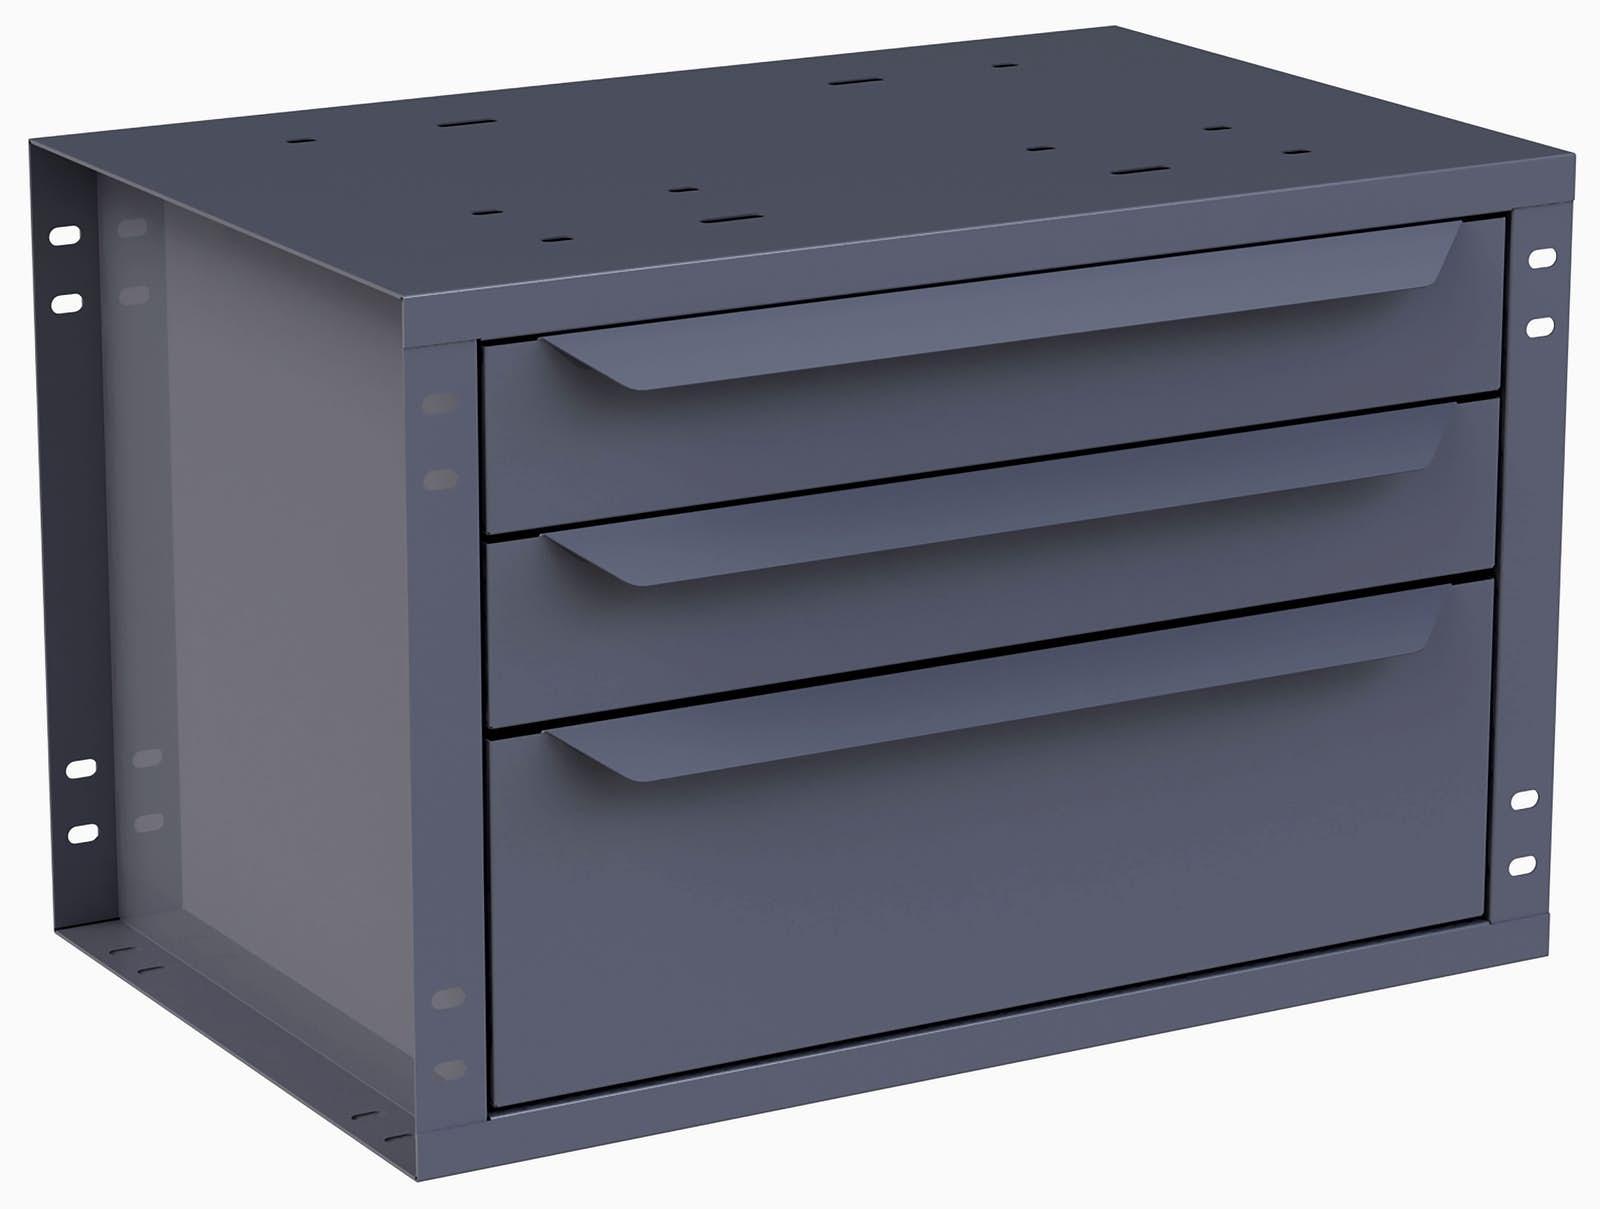 Masterack Van Cabinets